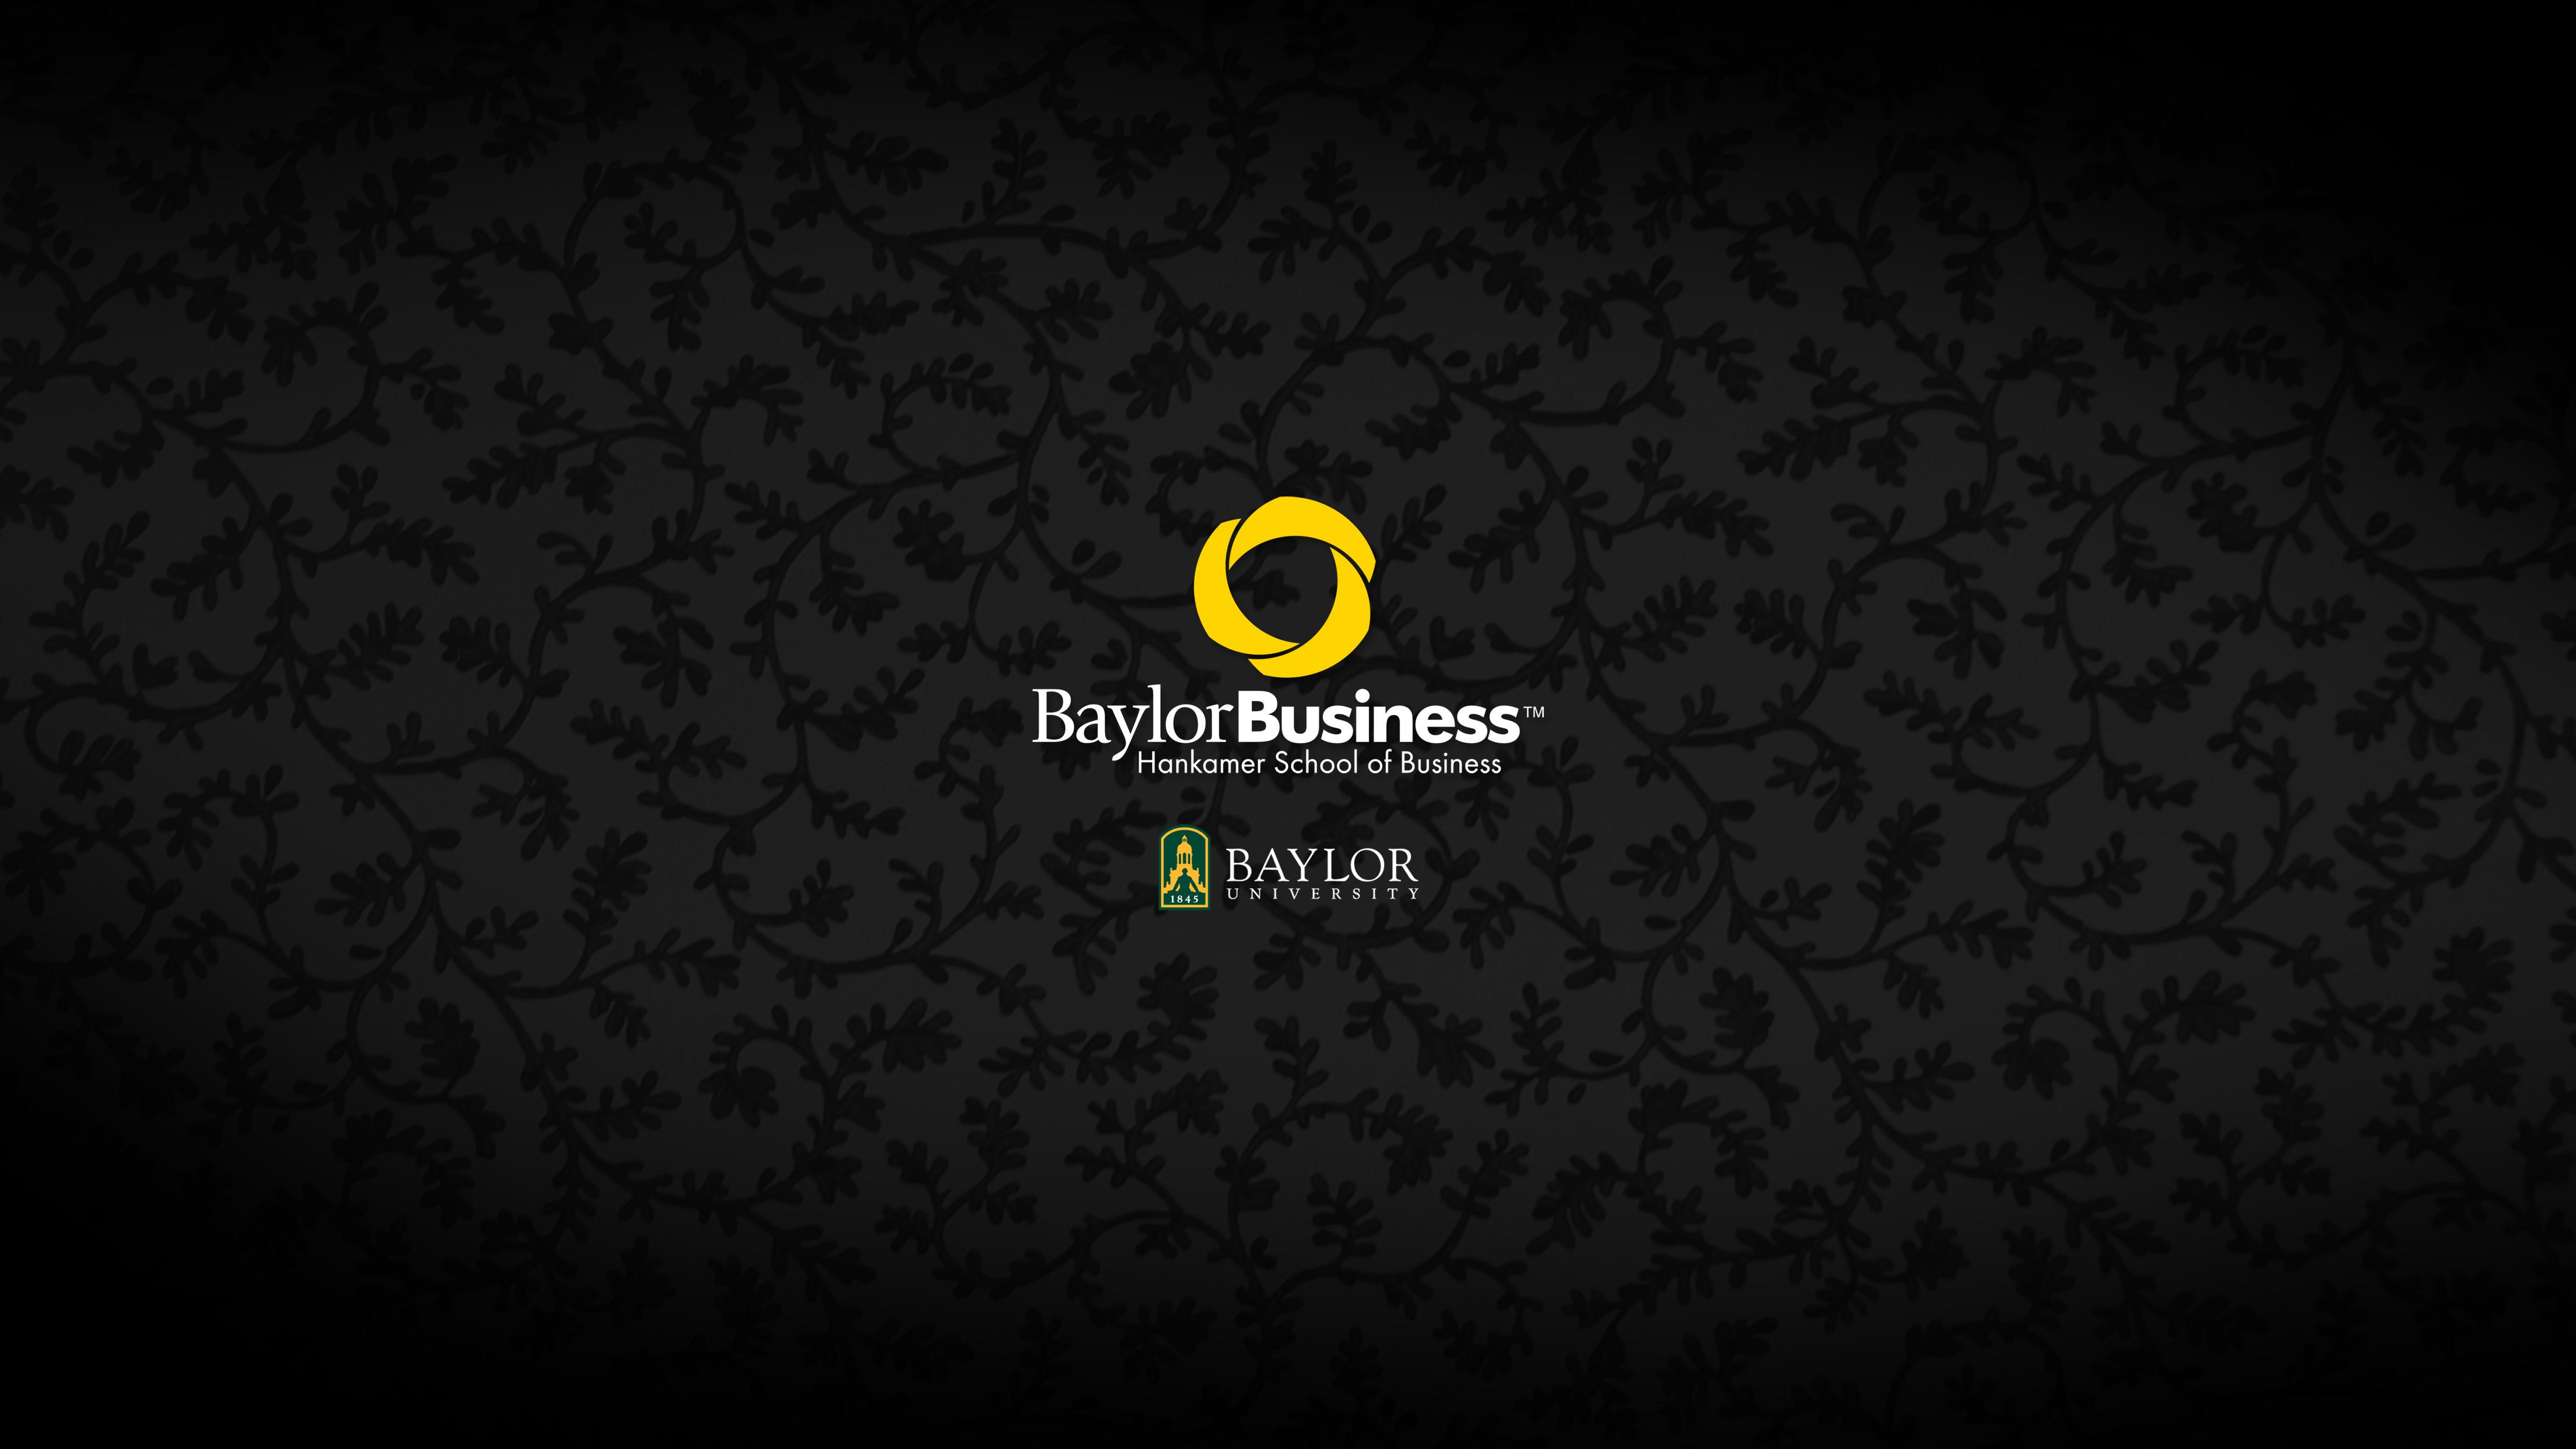 baylor logo wallpaper viewing gallery